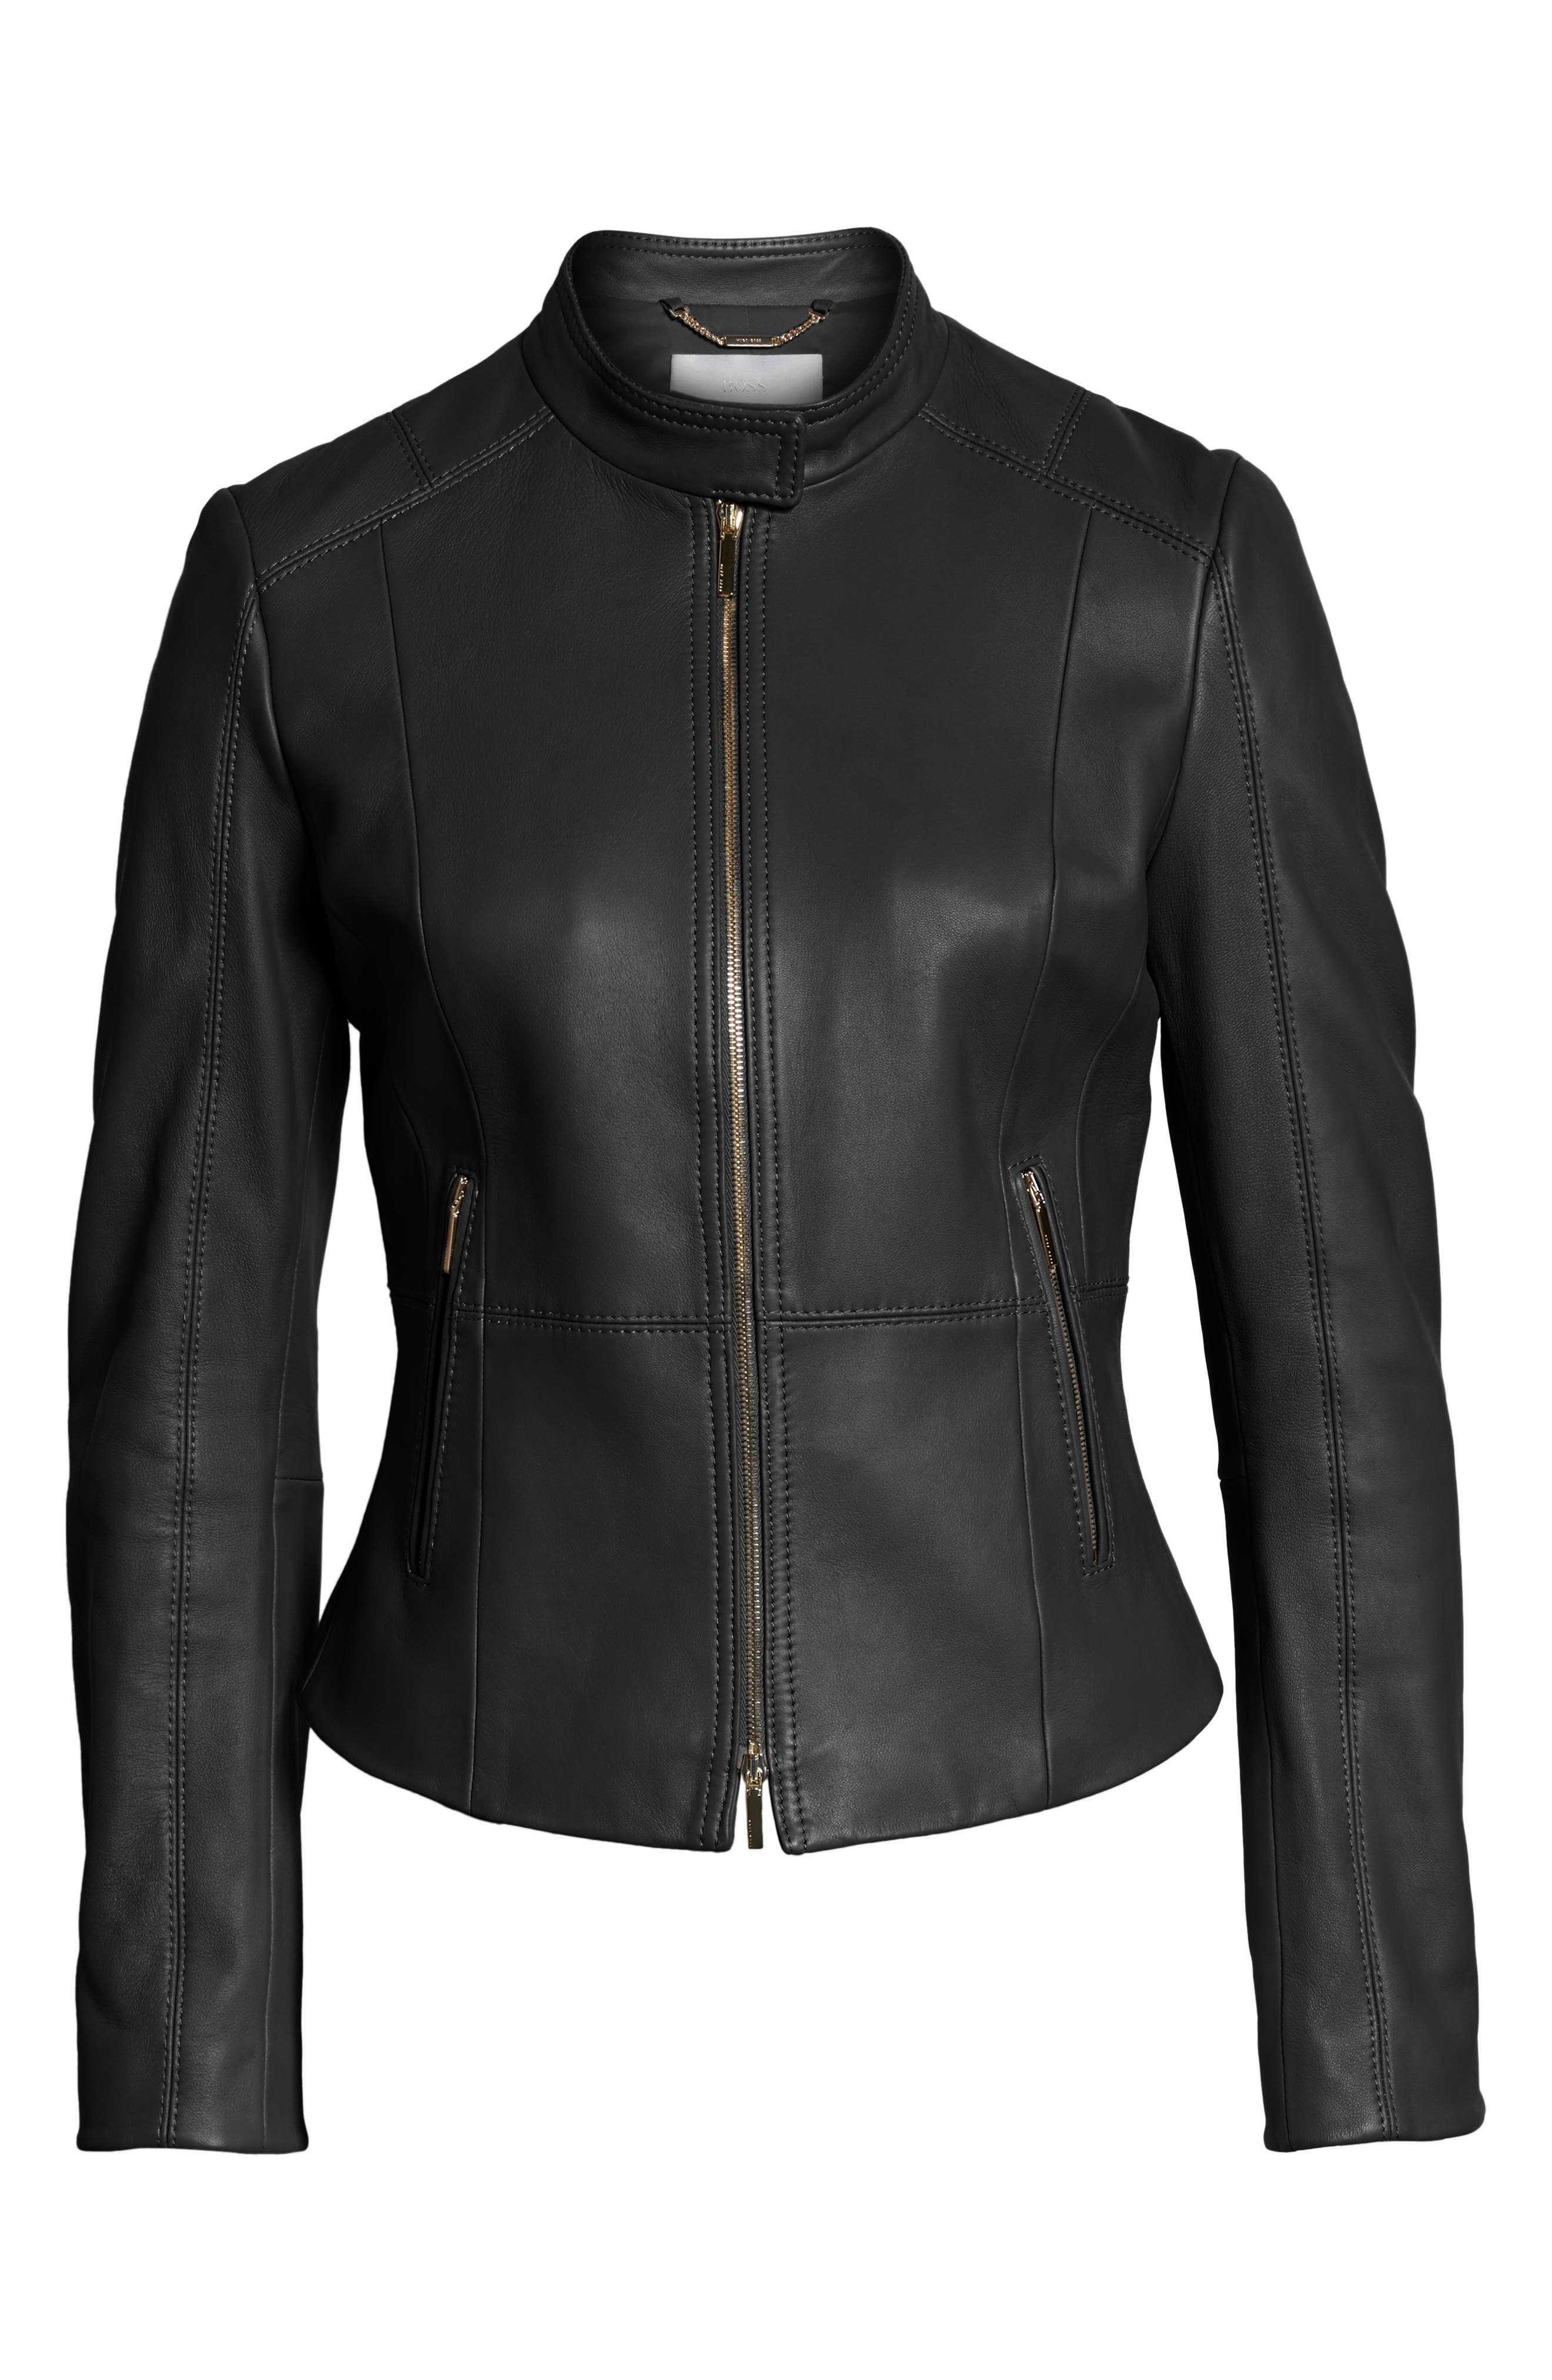 Sammonaie Leather Jacket,                             Main thumbnail 1, color,                             Black